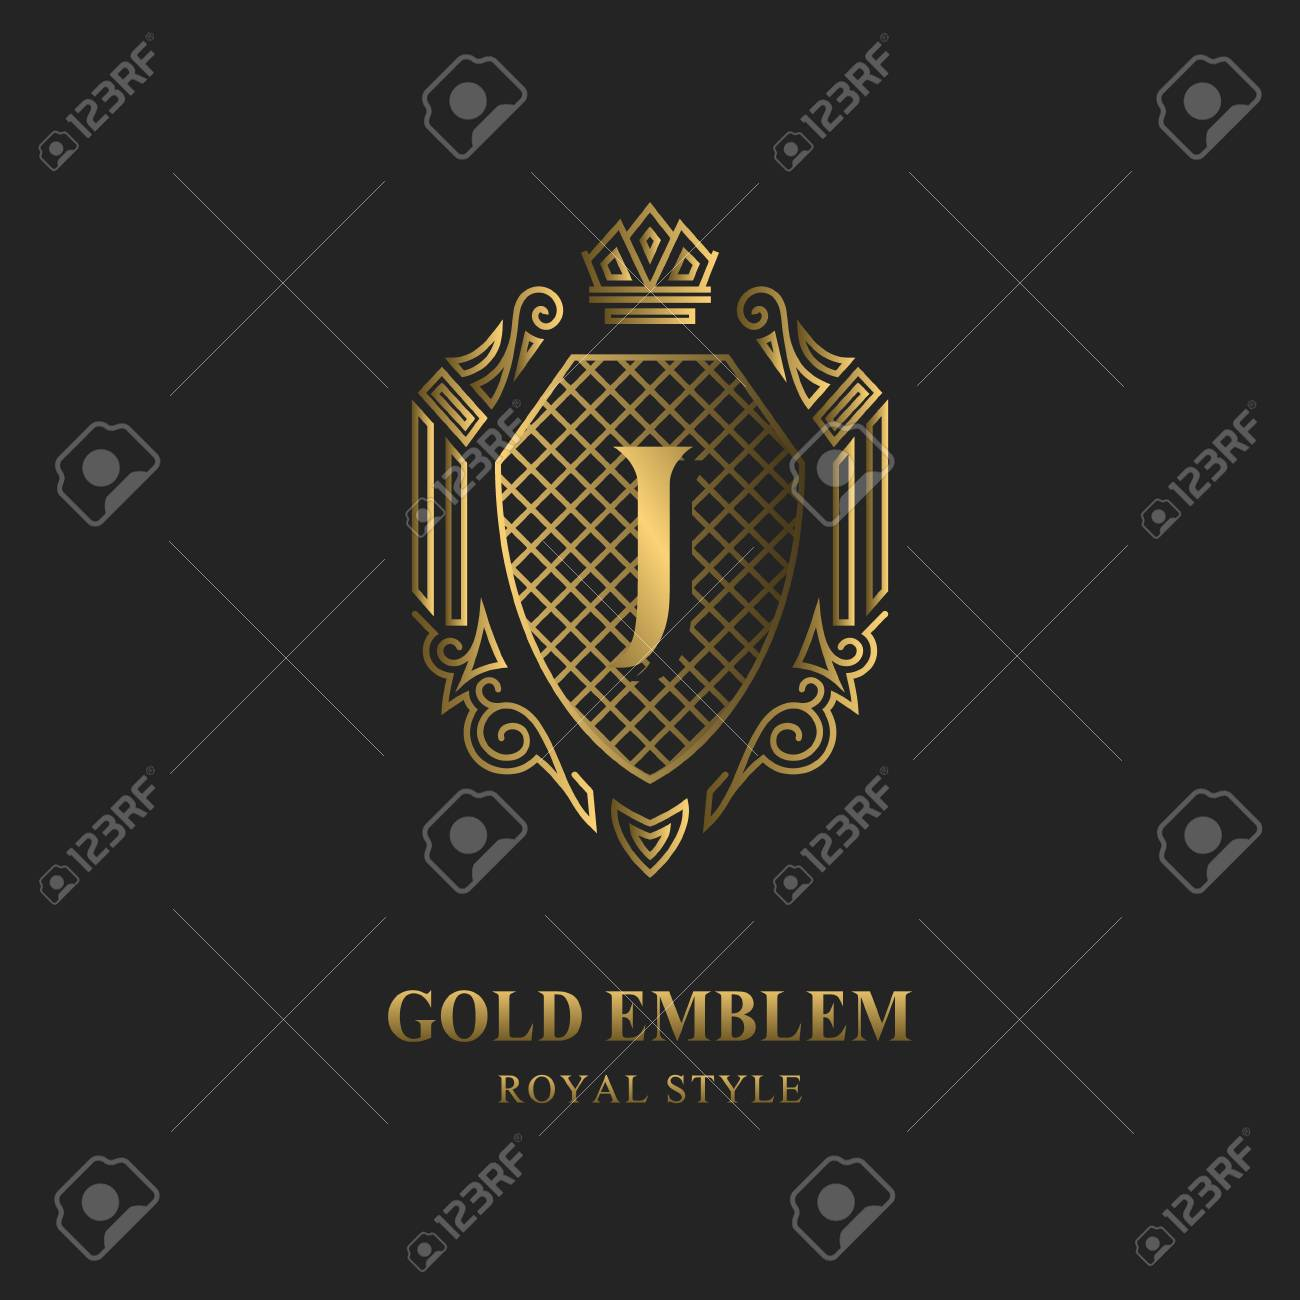 Royal monogram design. Luxury volumetric logo template. 3d line ornament. Emblem with letter J for Business sign, badge, crest, label, Boutique brand, Hotel, Restaurant, Heraldic. Vector illustration - 108495450